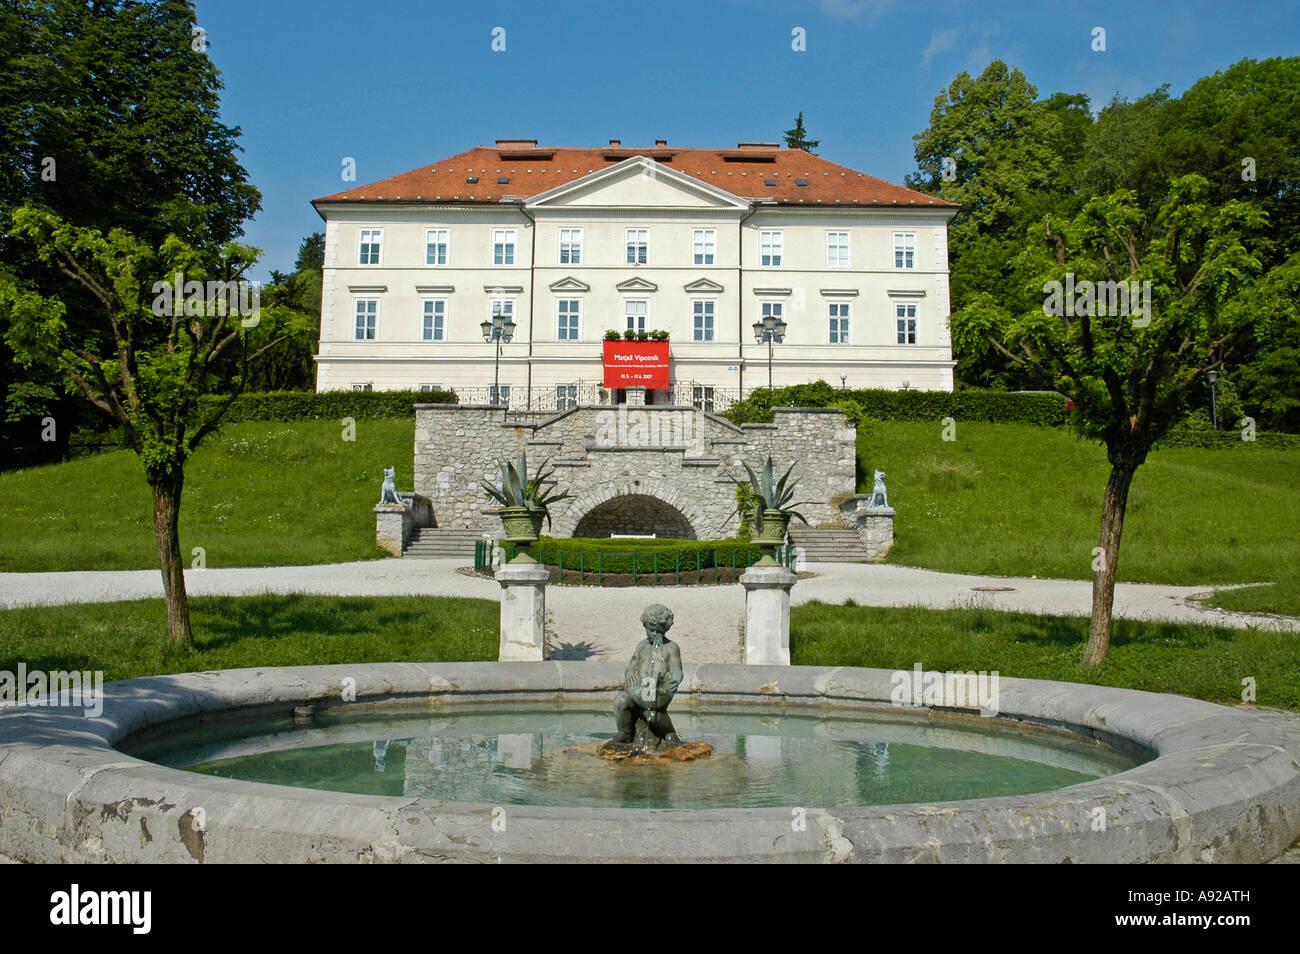 Tivoli Burg, internationale bildende Kunstzentrum, Ljubljana, Slowenien Stockbild